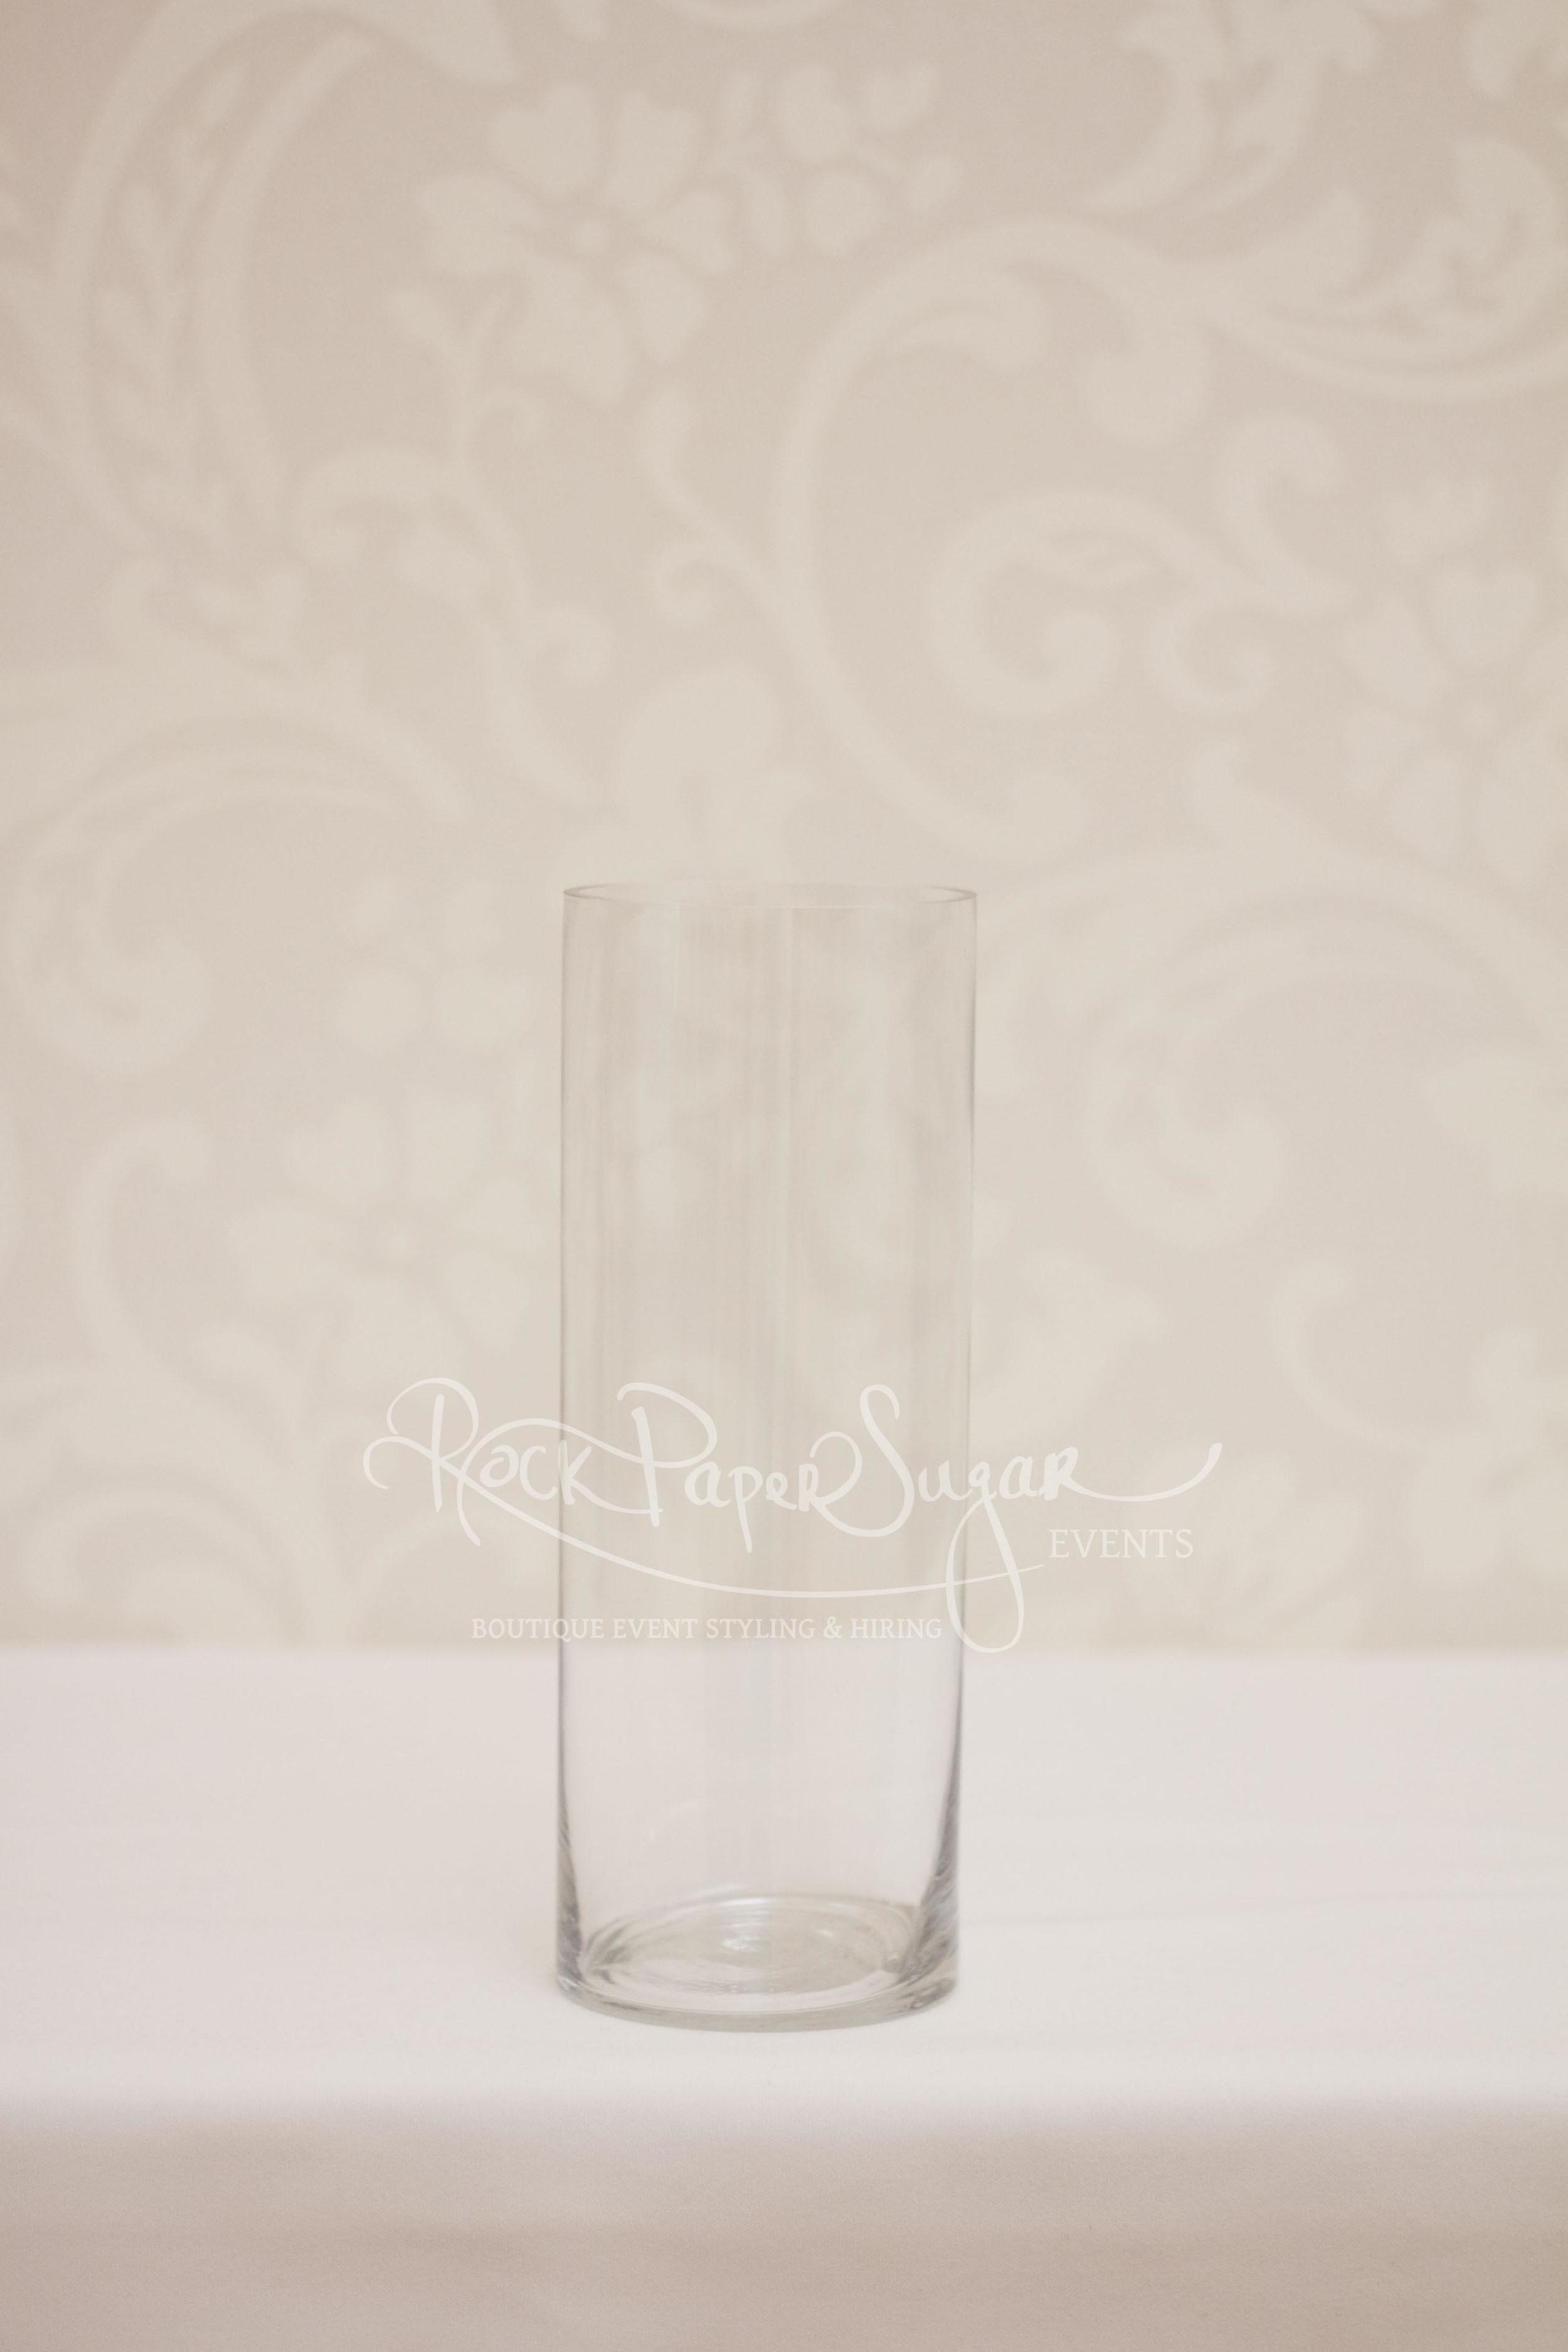 Rock Paper Sugar Events Glassware 008.jpg